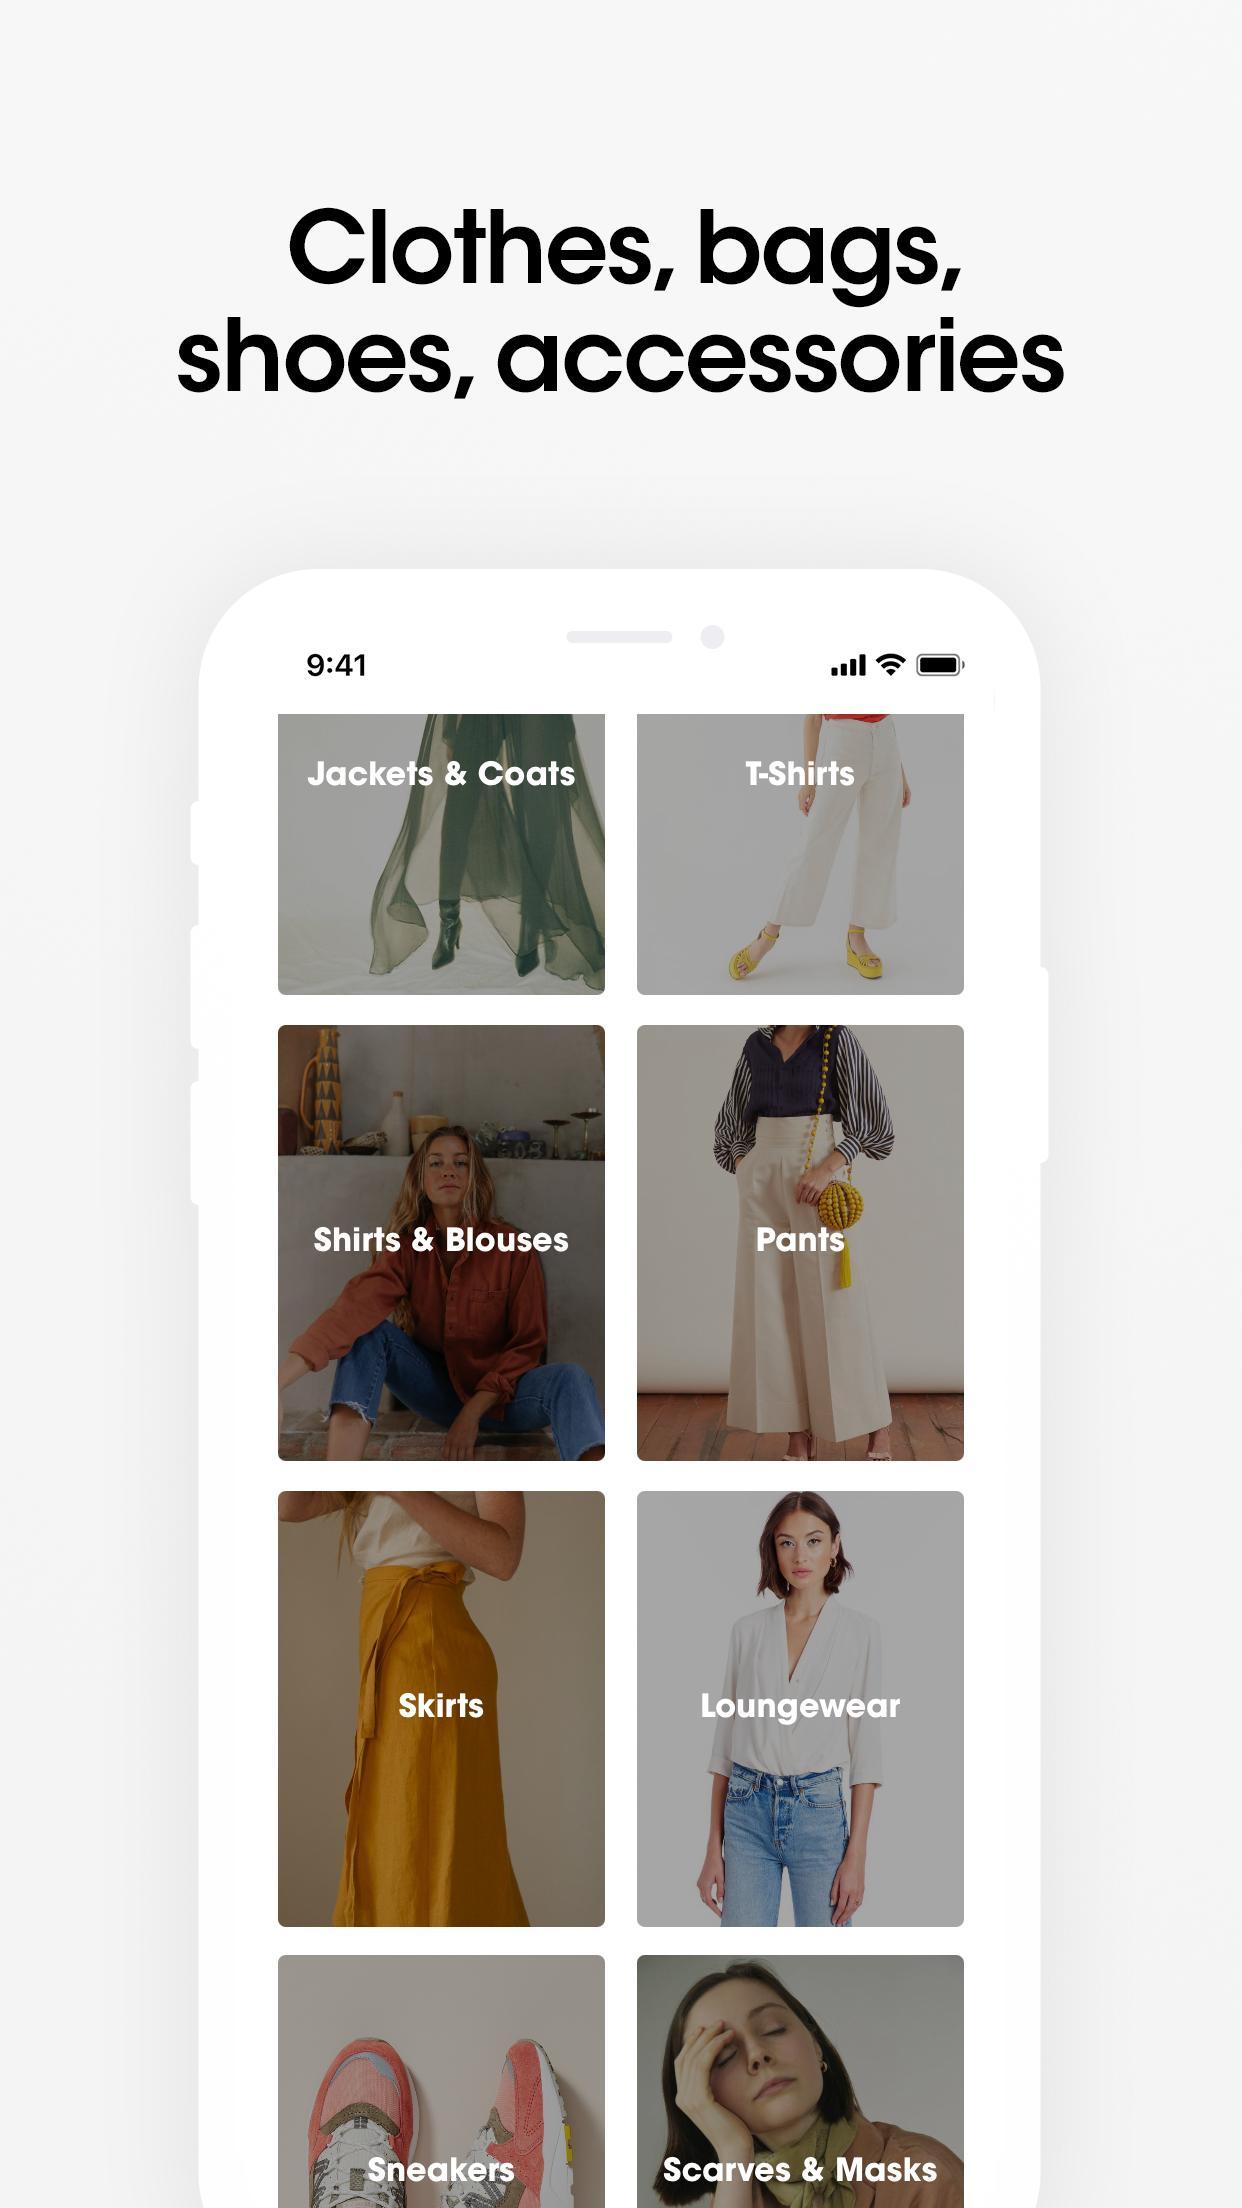 Autumn App - Fashion & Home Decor 1.16.0 Screenshot 4